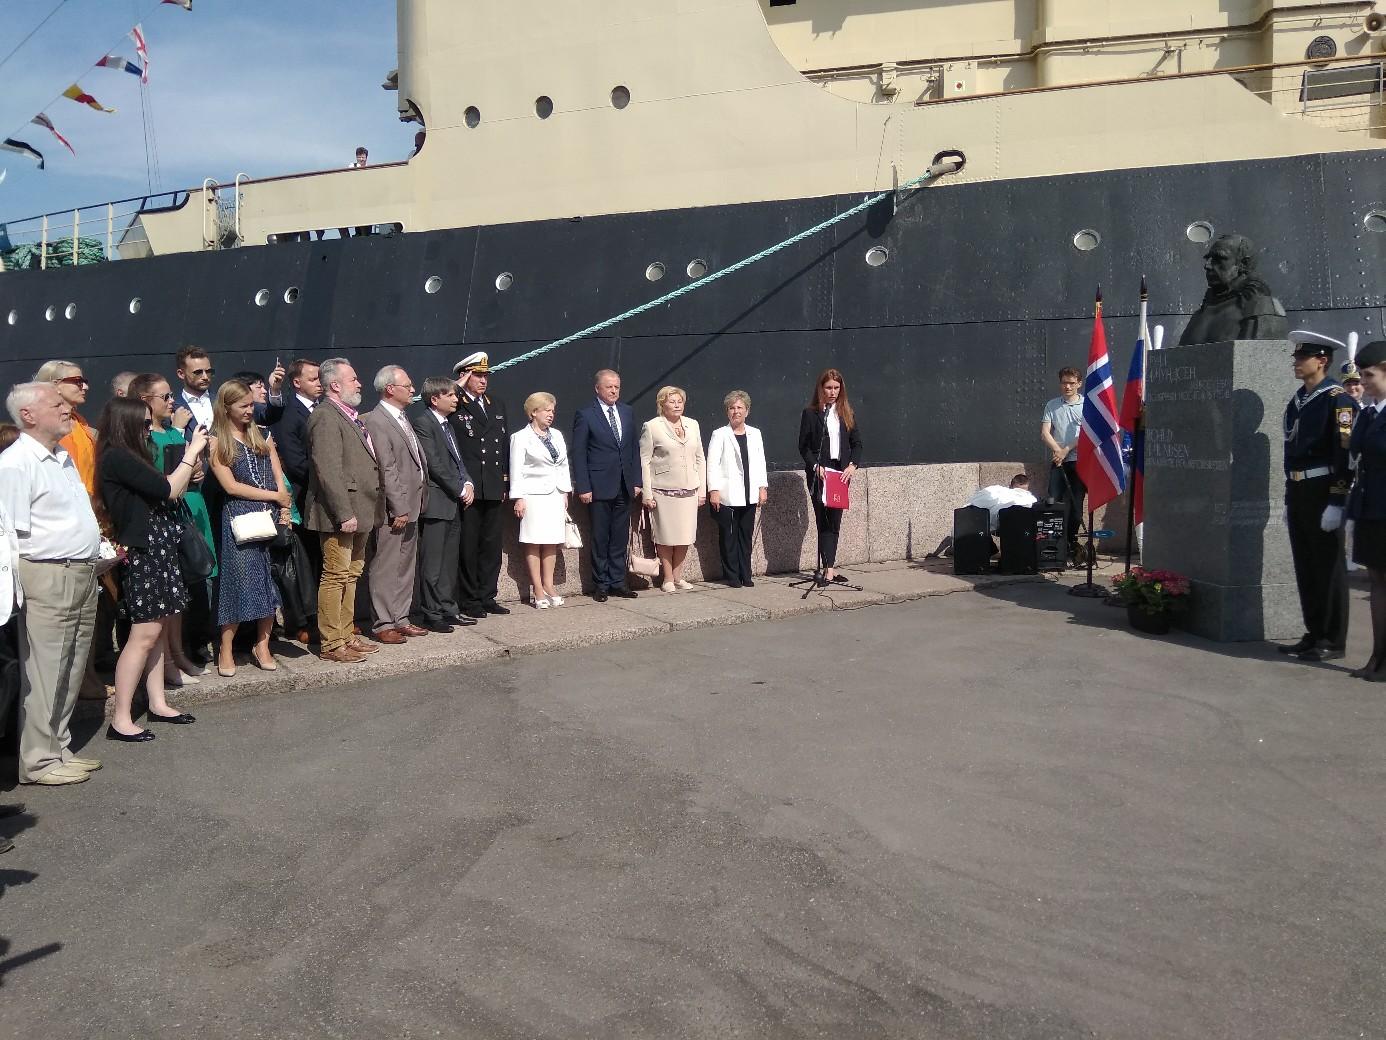 У ледокола «Красин» открыли памятник Руалю Амундсену